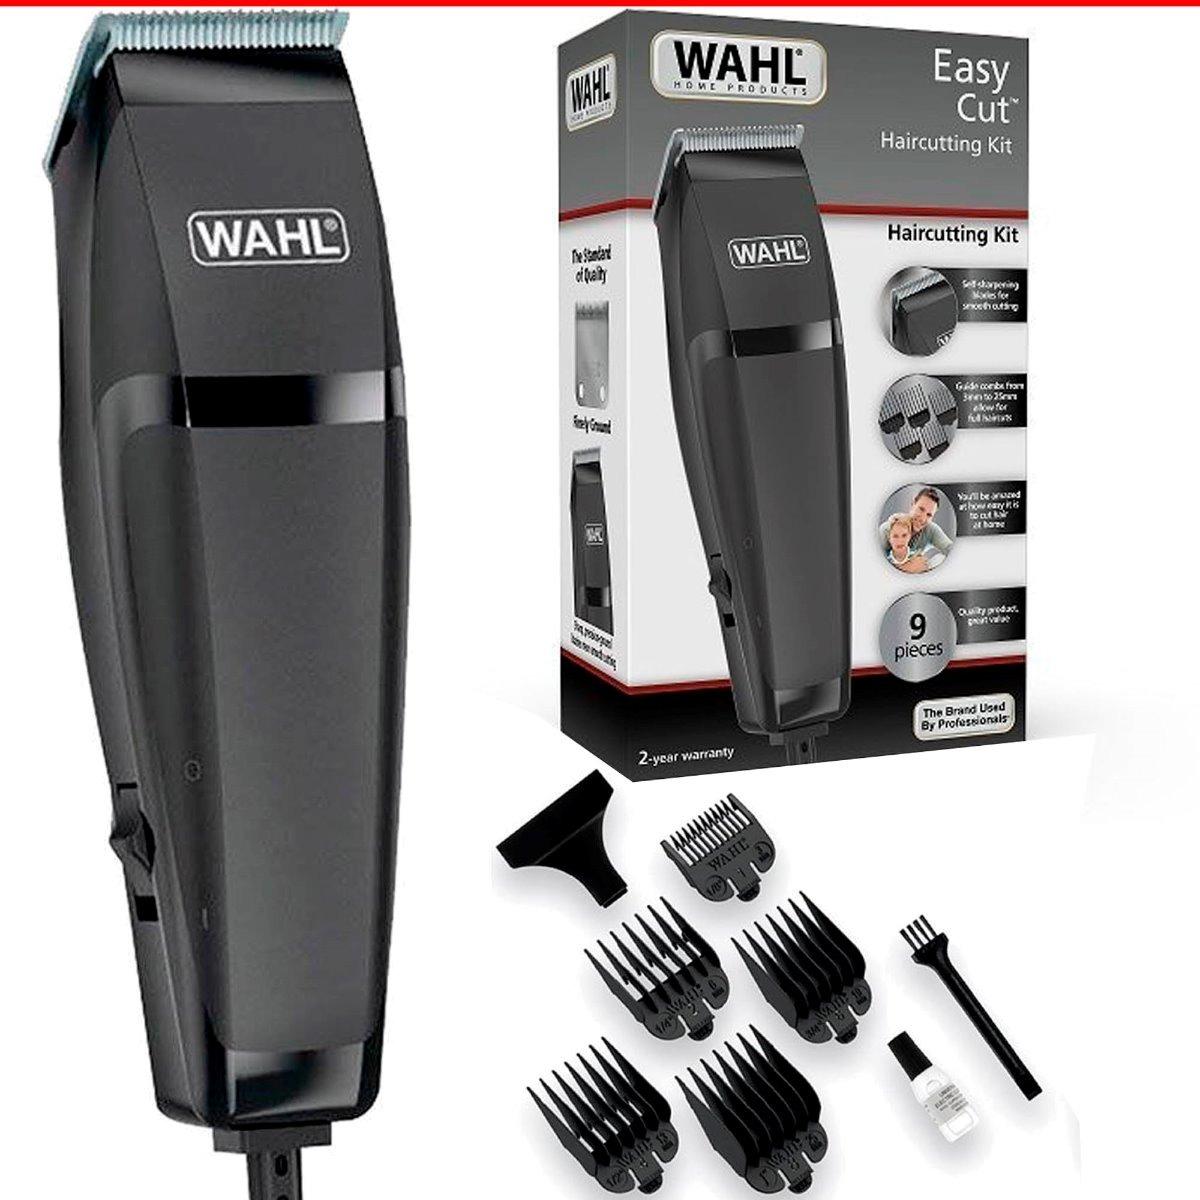 943d81e9e máquina cortar cabelo barba wahl clipper easy cut preto 110v. Carregando  zoom.